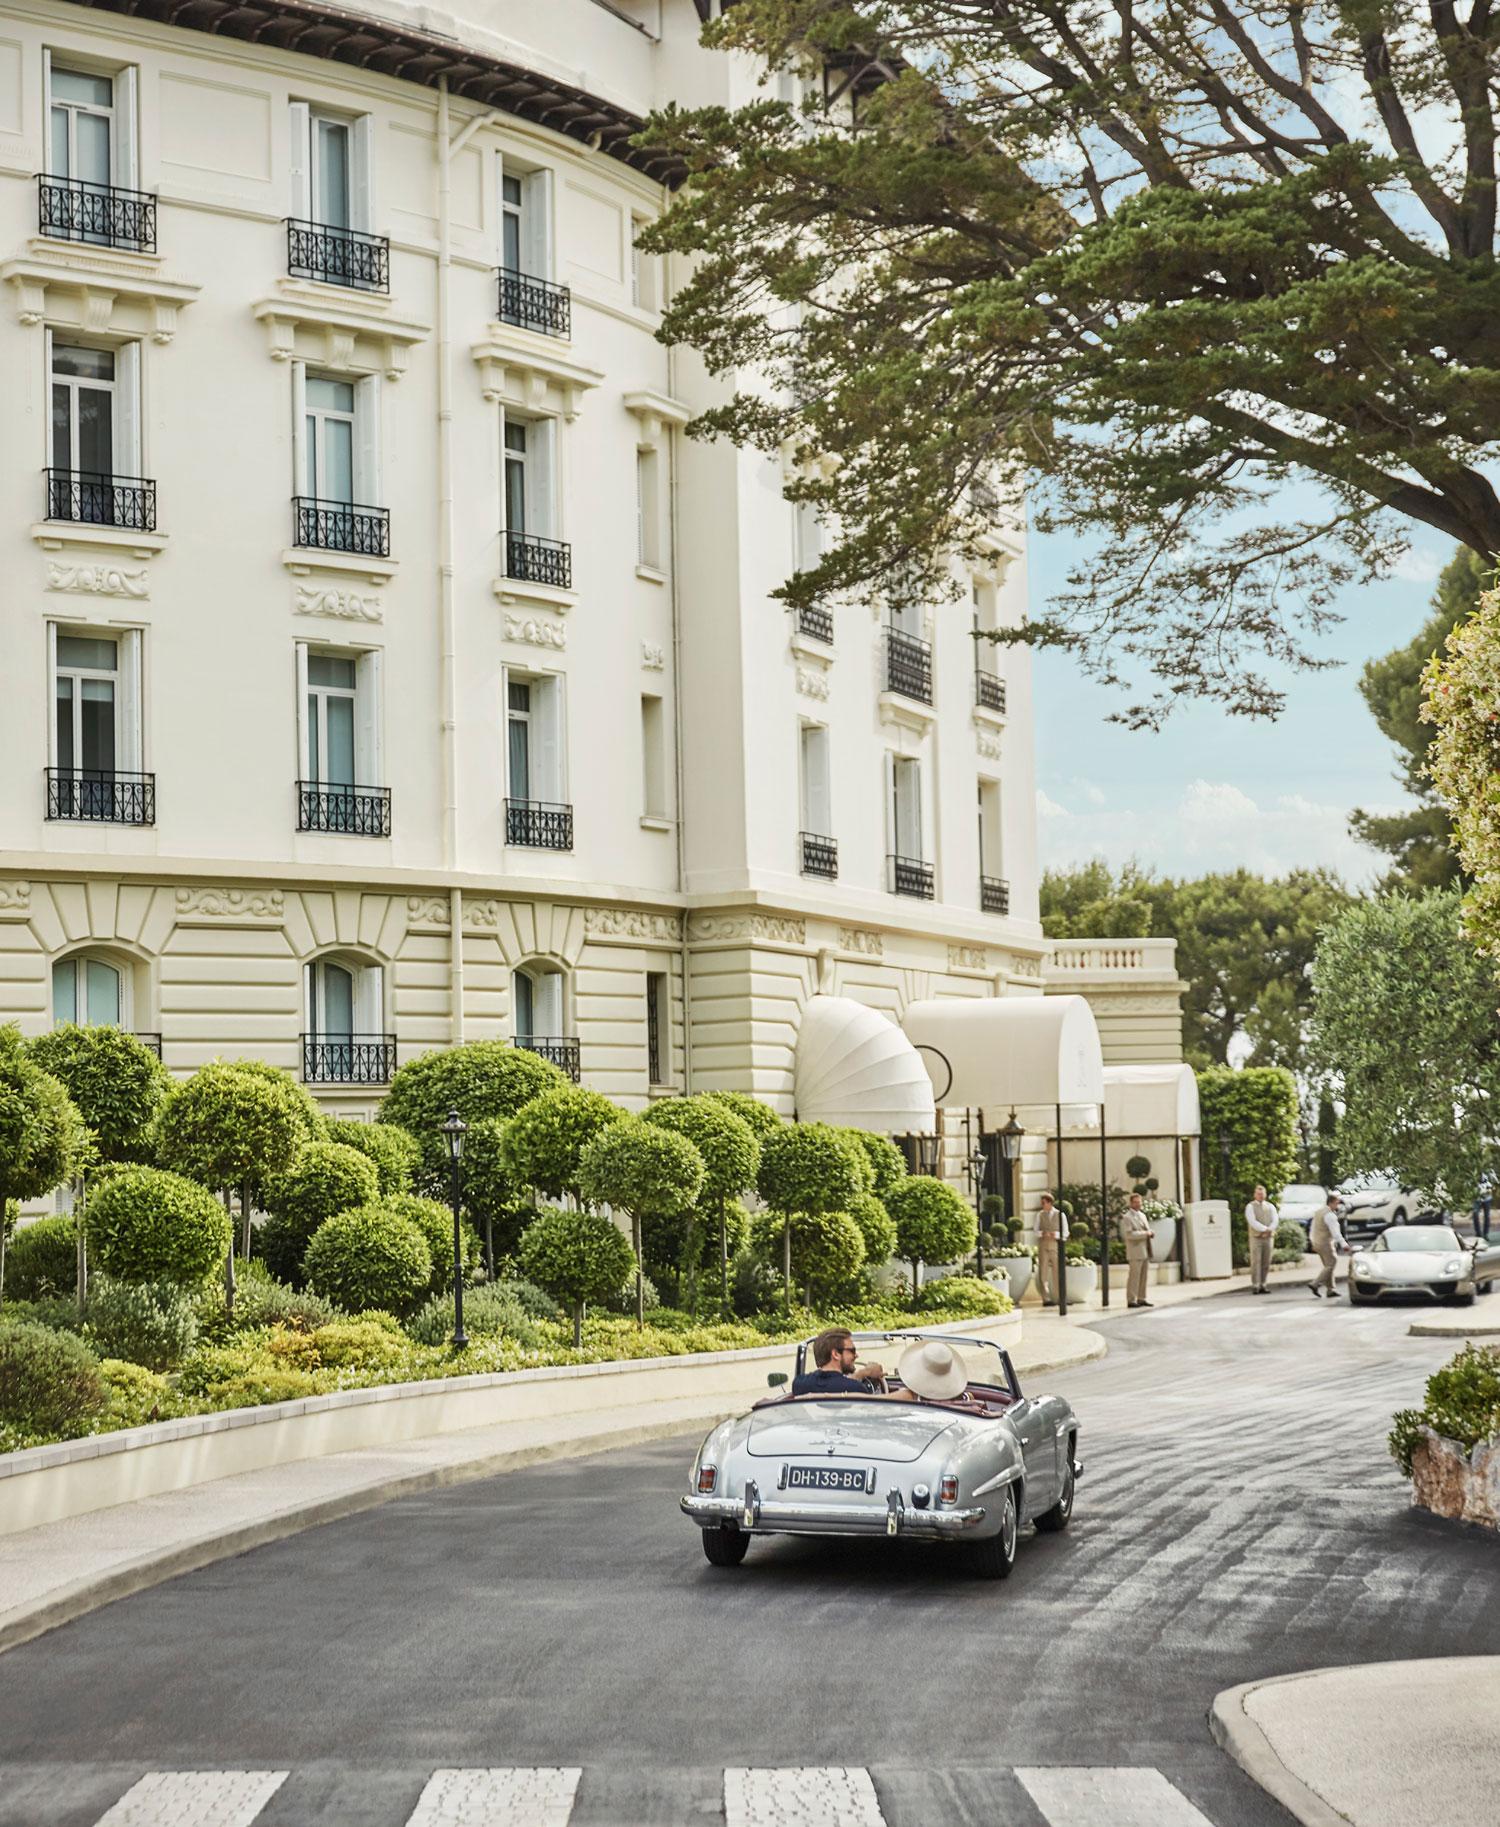 Grand Hotel du Cap Ferrat Four Seasons Hotel south of france French riviera